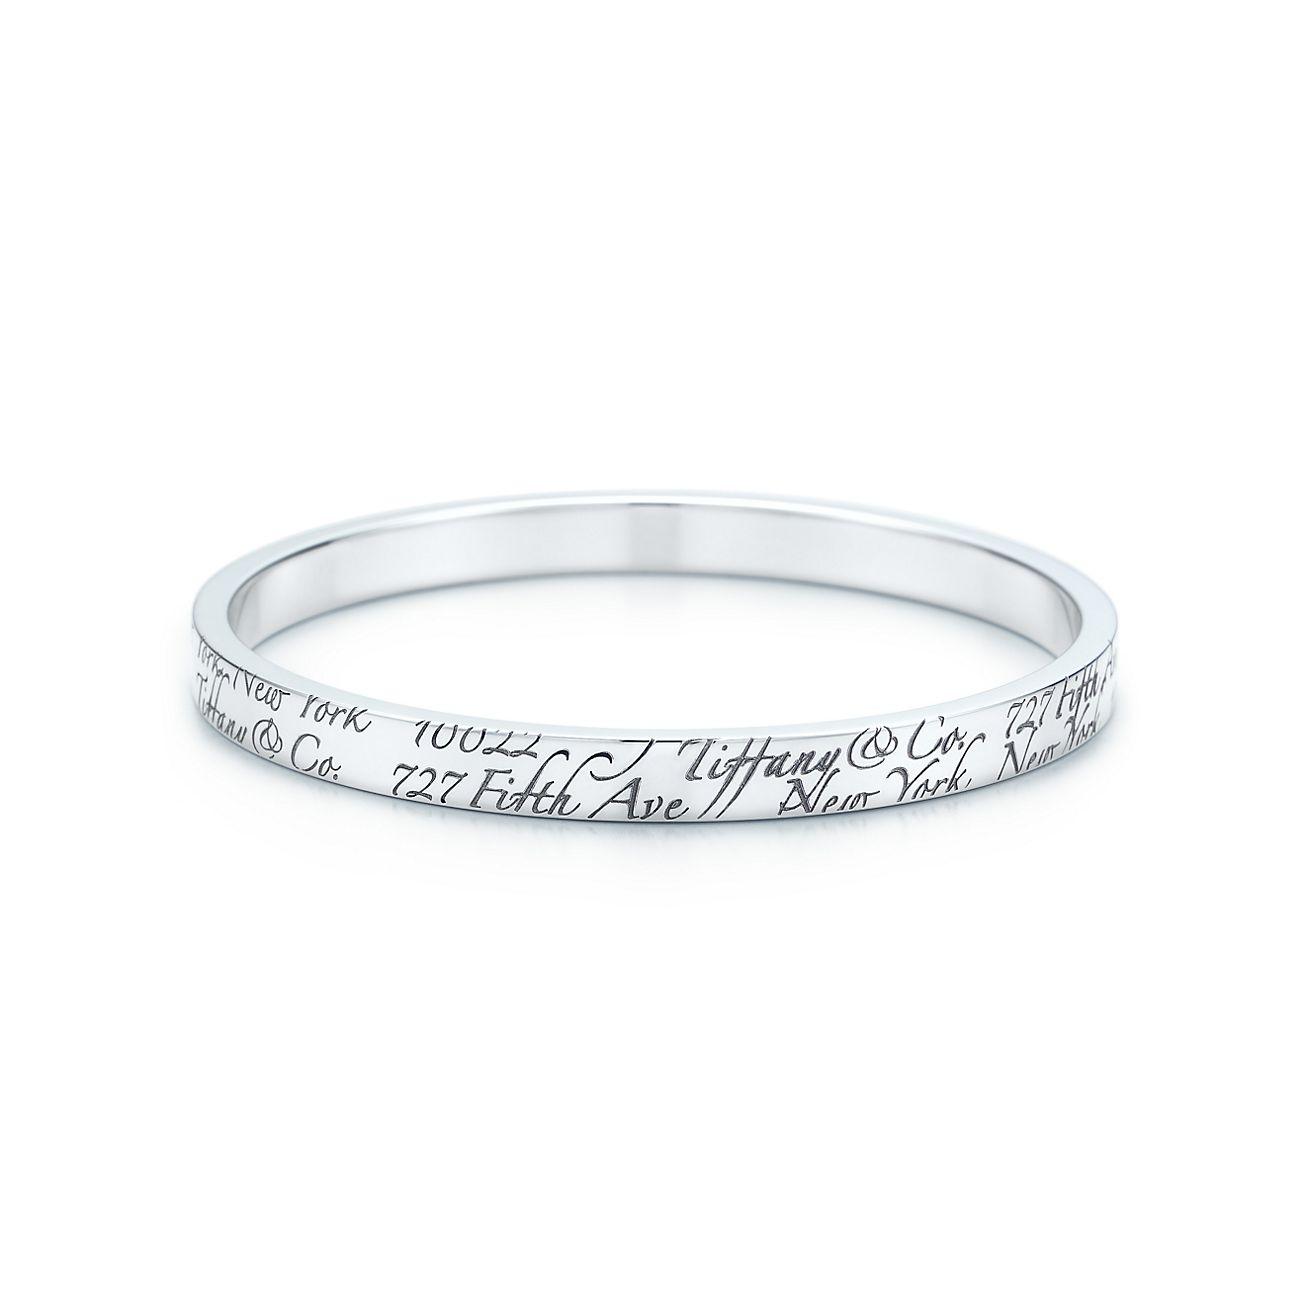 Jewelry Bracelets Tiffany Notes Bangle 23019442 Tiffany Bangle Bracelet